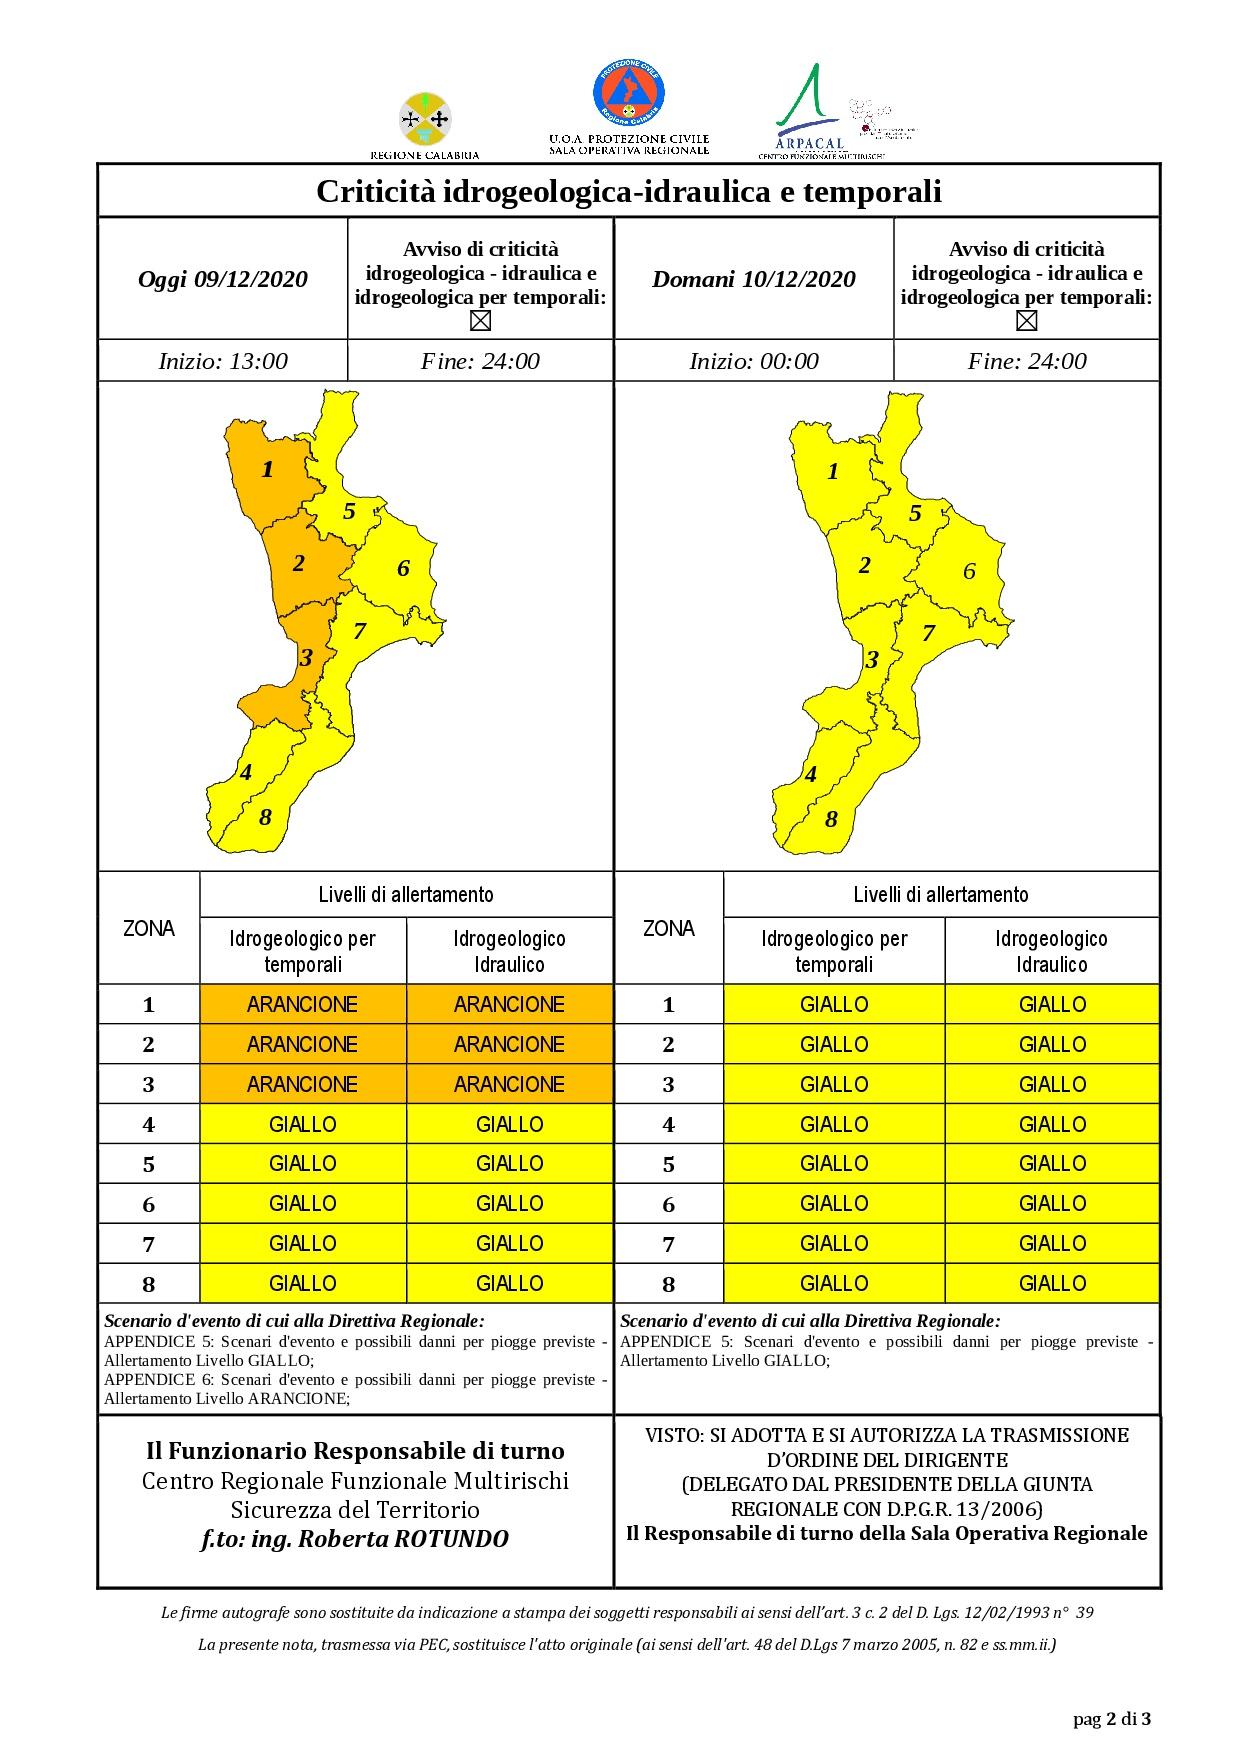 Criticità idrogeologica-idraulica e temporali in Calabria 09-12-2020